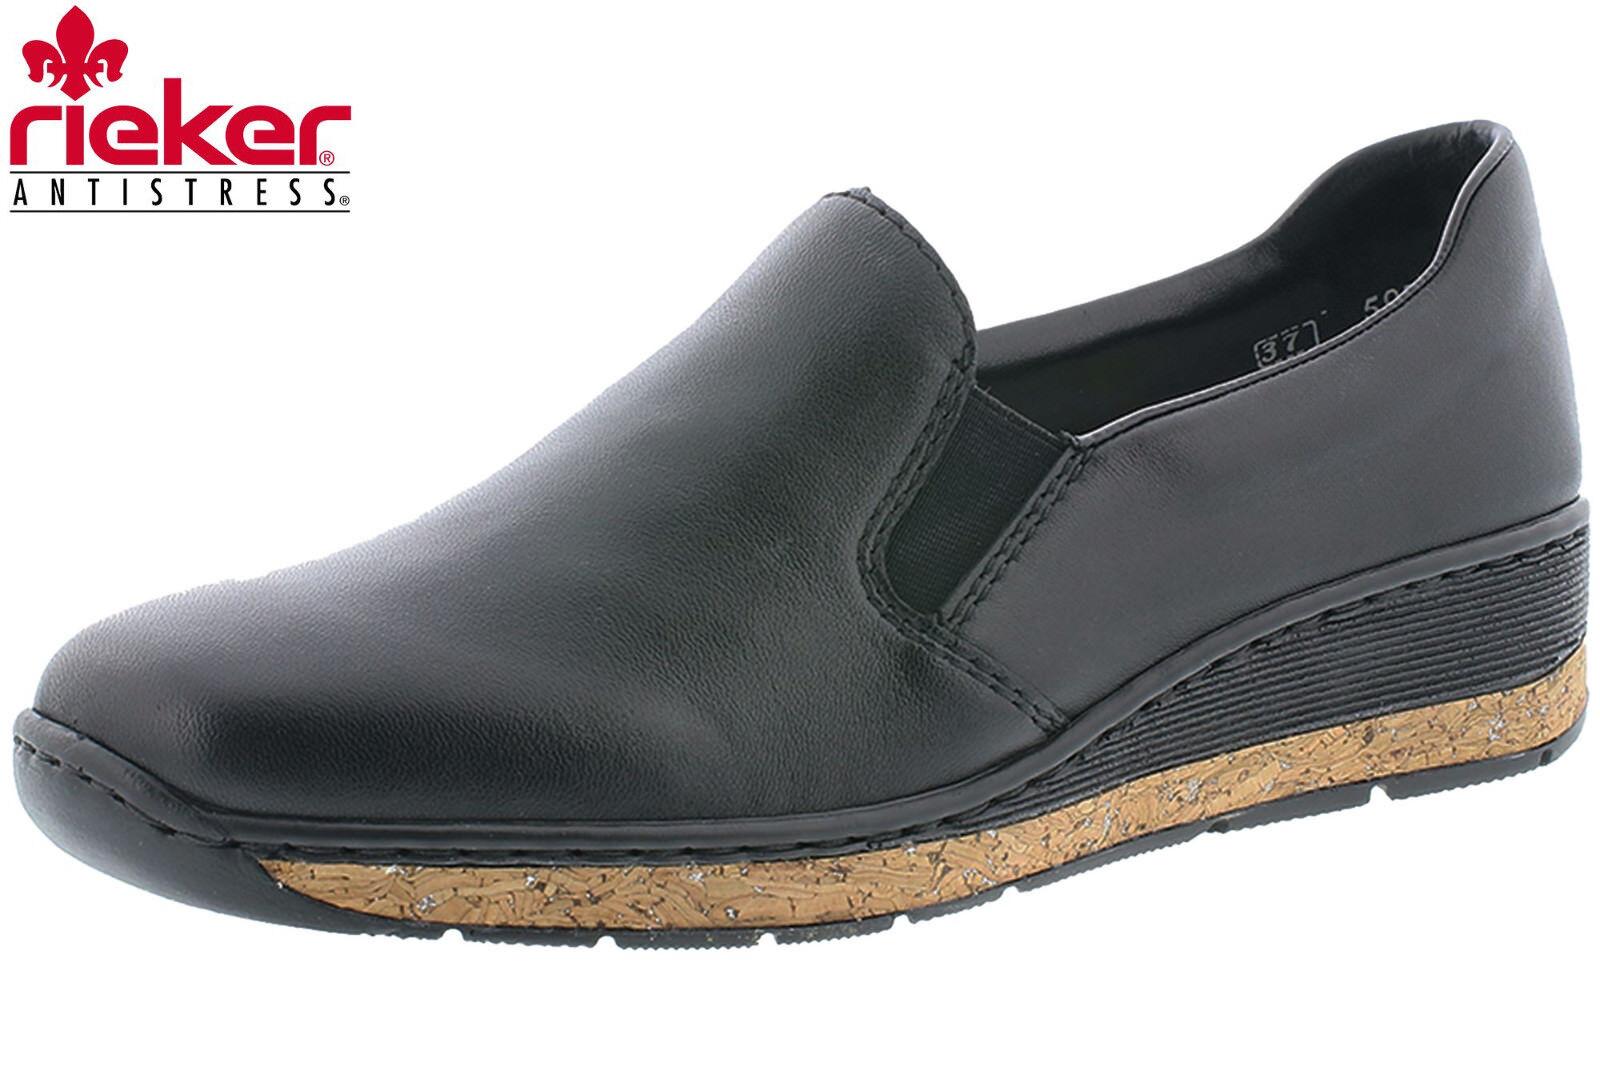 Rieker Damen Slipper Schwarz Leder Schuhe Frühjahr Sommer Bequem 59766-00 NEU